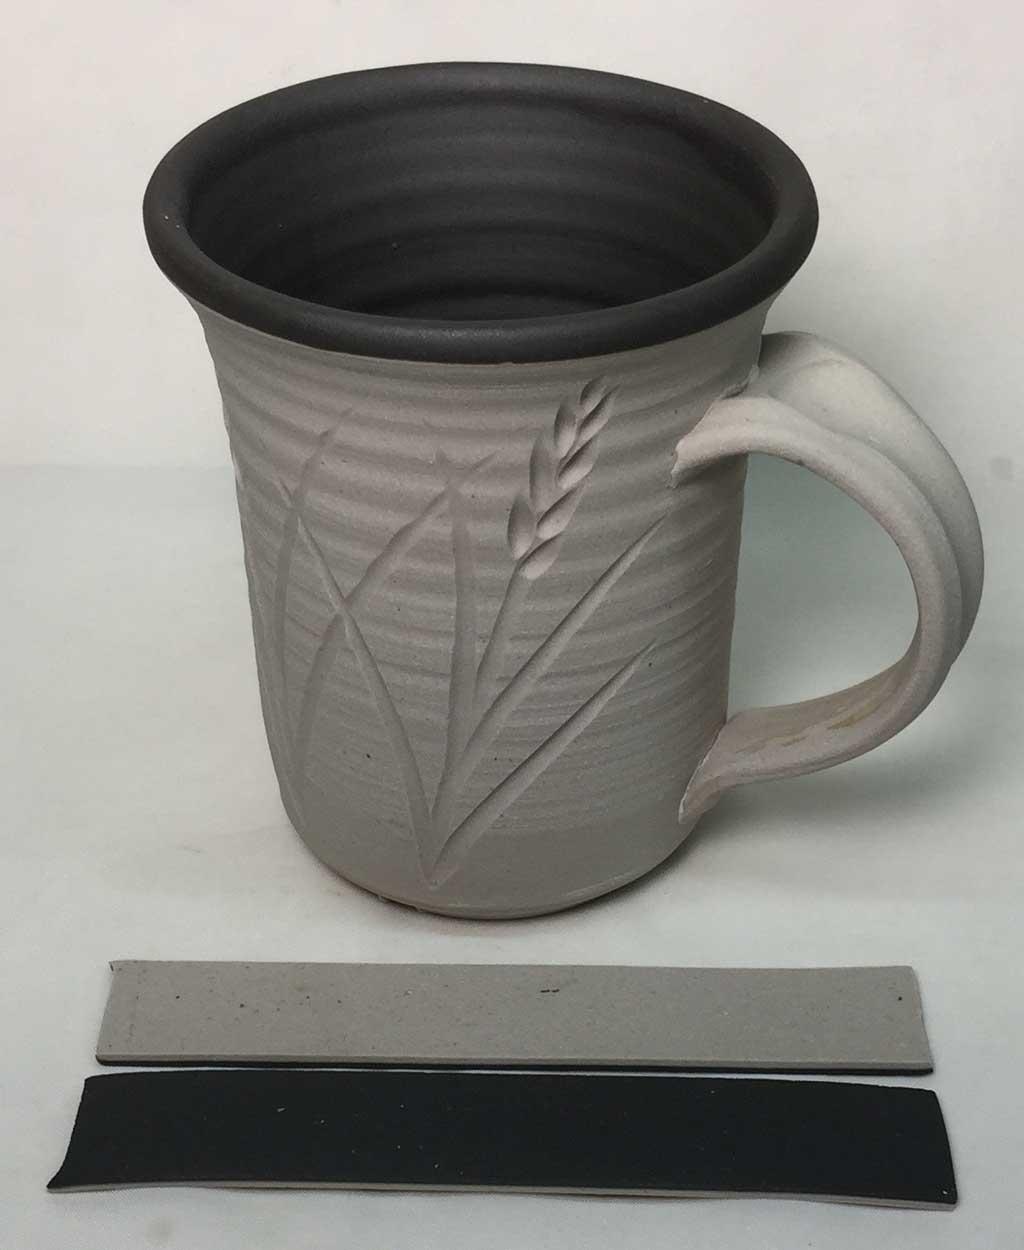 L3954J black engobe on a cone 10 whiteware body